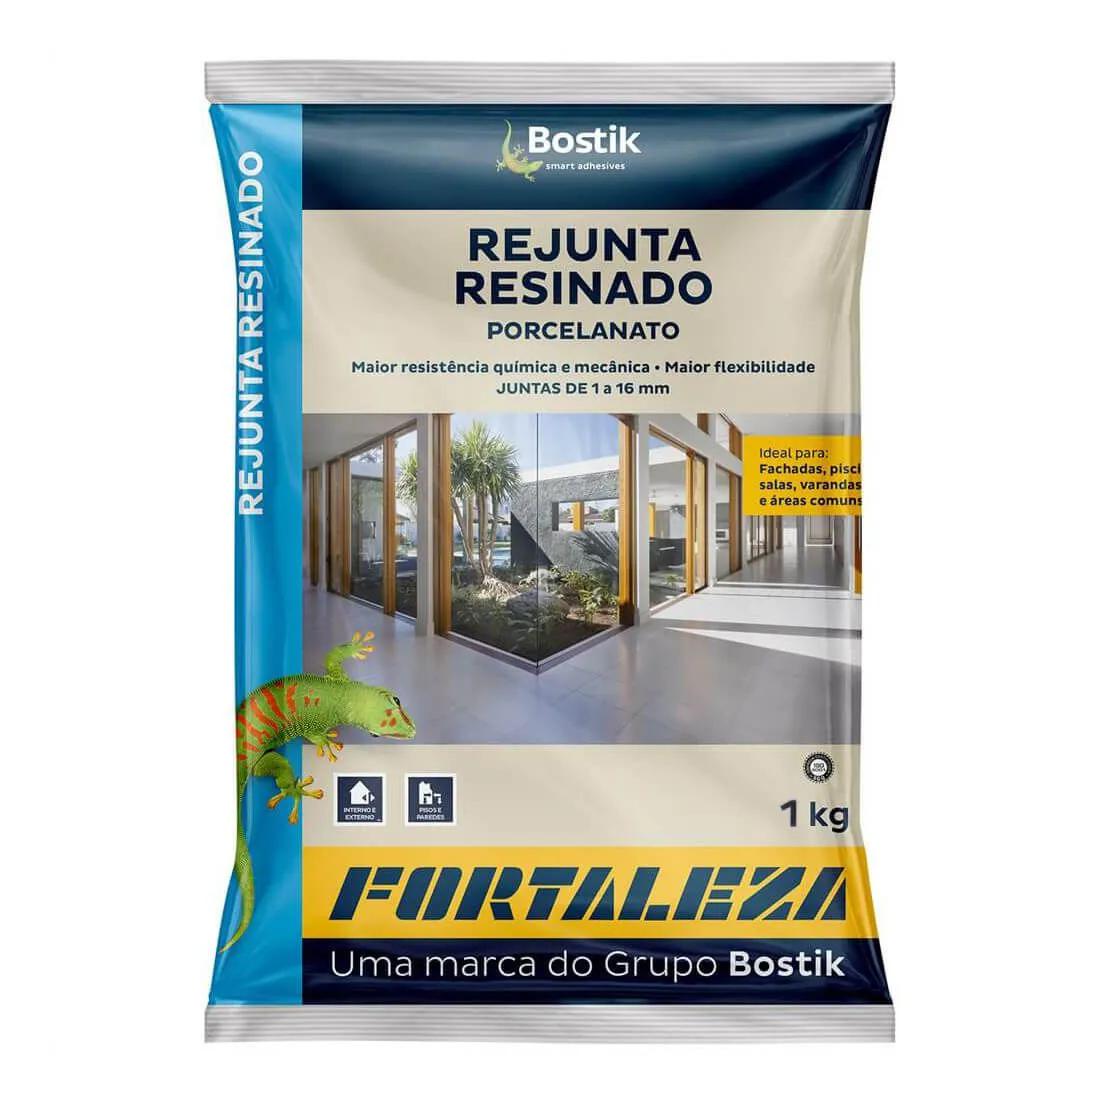 Rejunte Resinado Porcelanato 1 kg - FORTALEZA